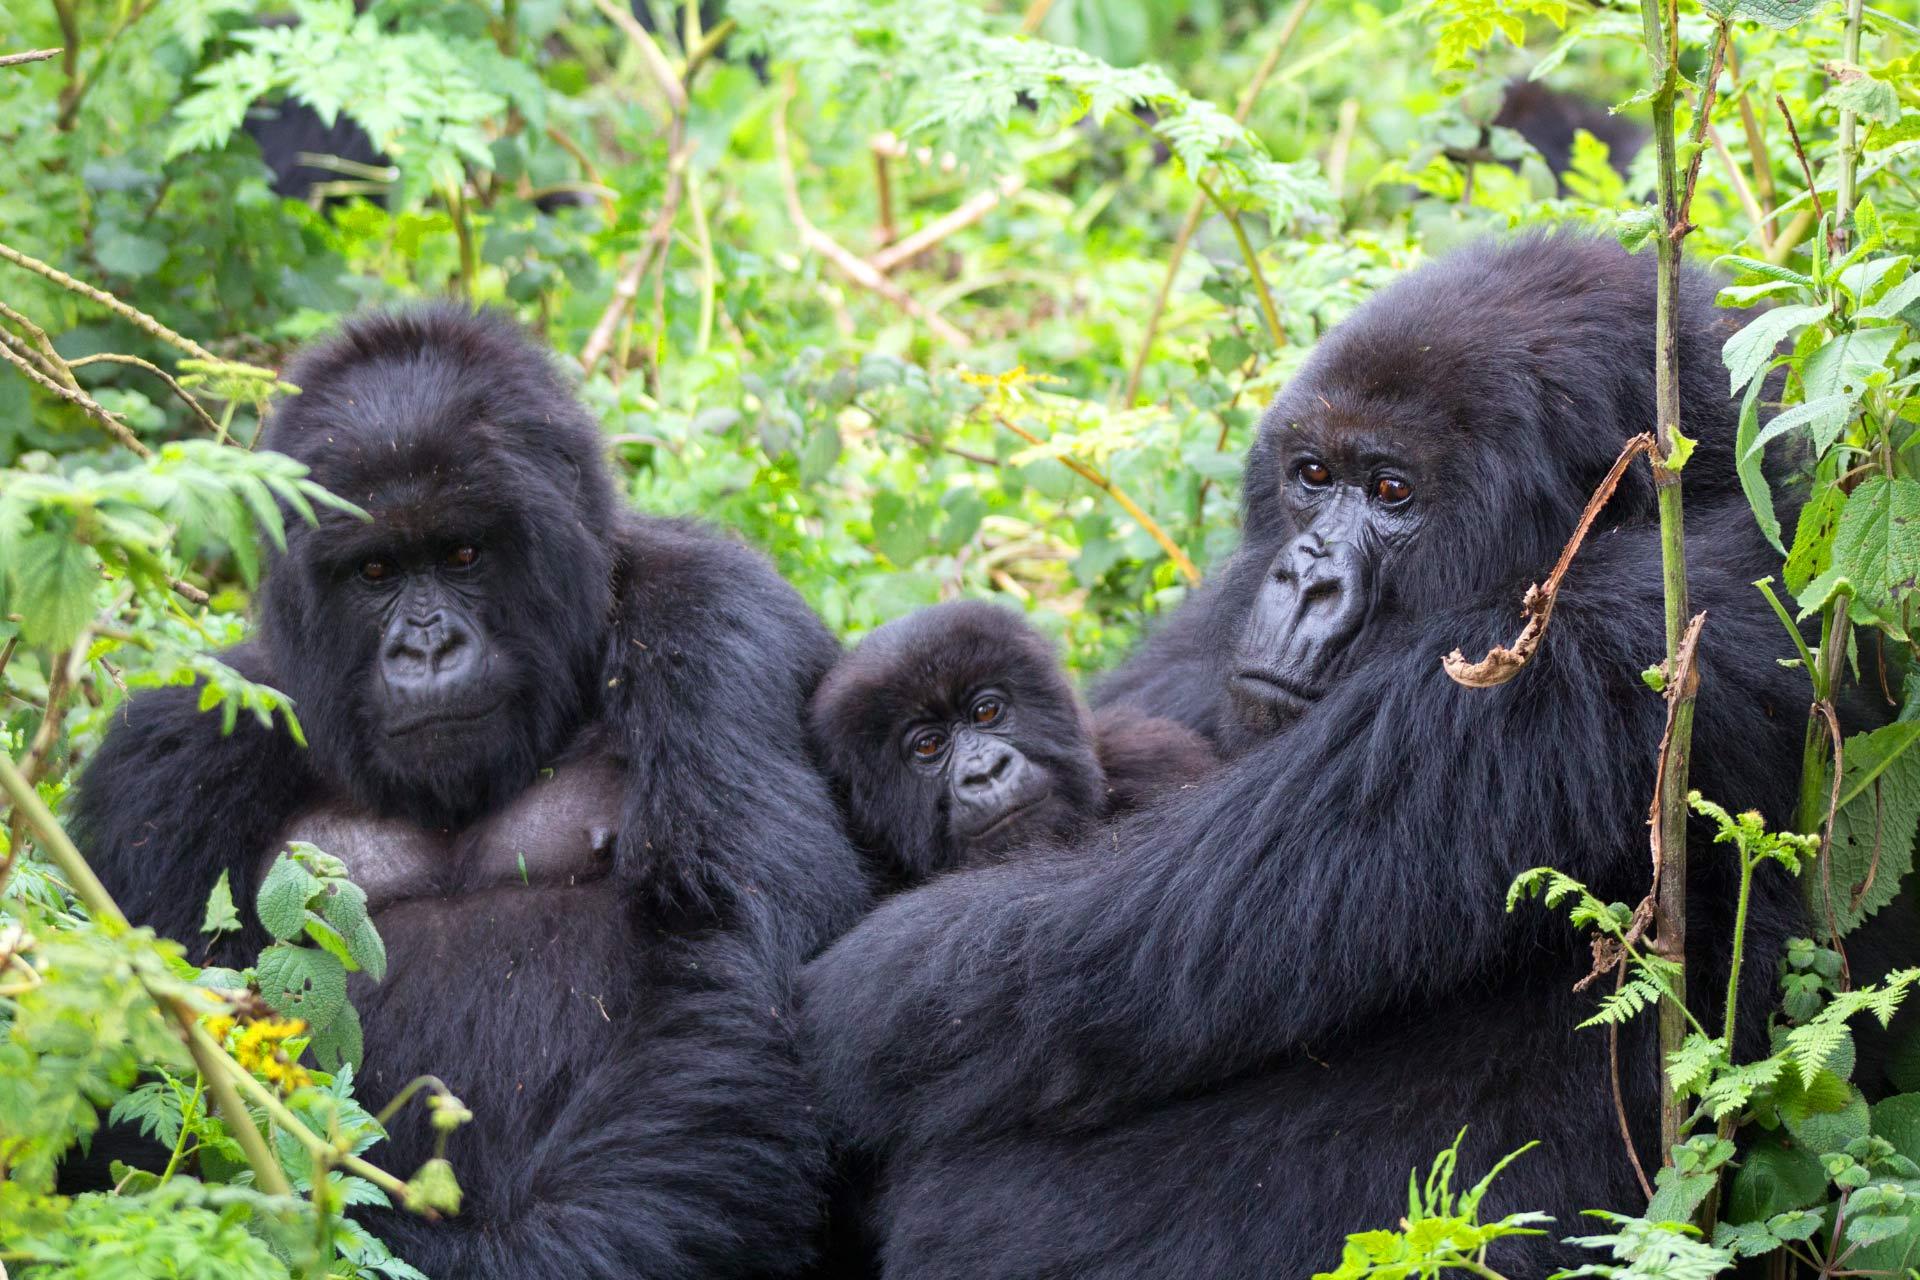 Rushaga the best section for gorilla safaris in Bwindi